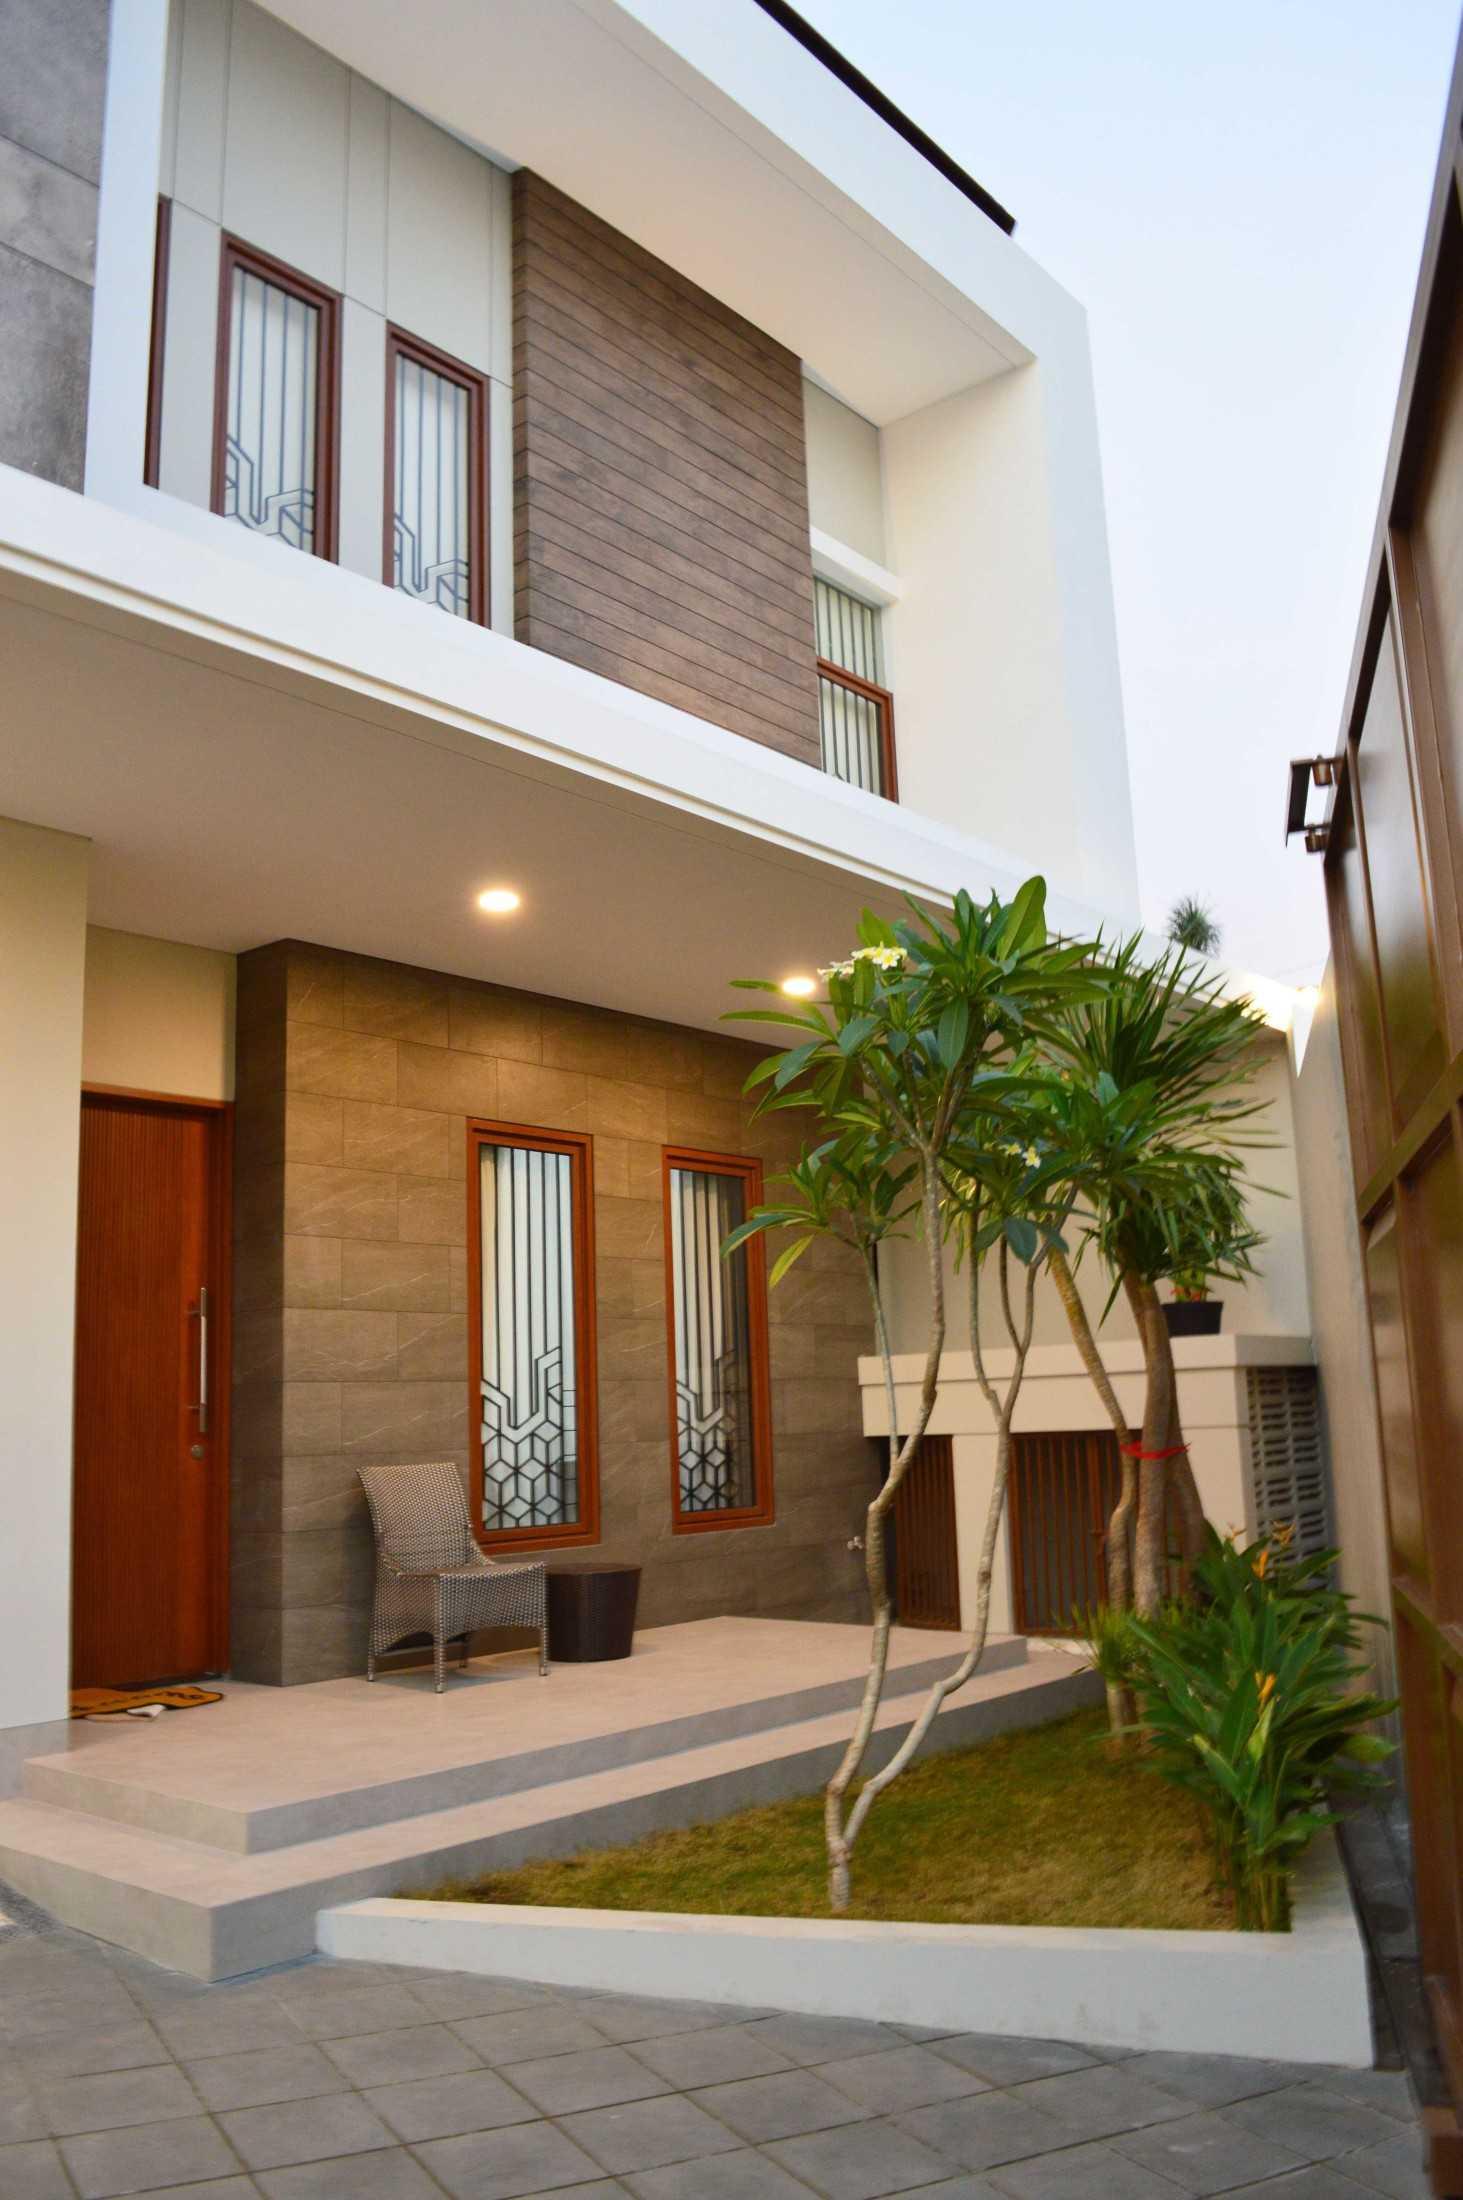 Conarch Studio Modern House With Natural Color Palette Surakarta, Kota Surakarta, Jawa Tengah, Indonesia Surakarta, Kota Surakarta, Jawa Tengah, Indonesia Exterior  122971